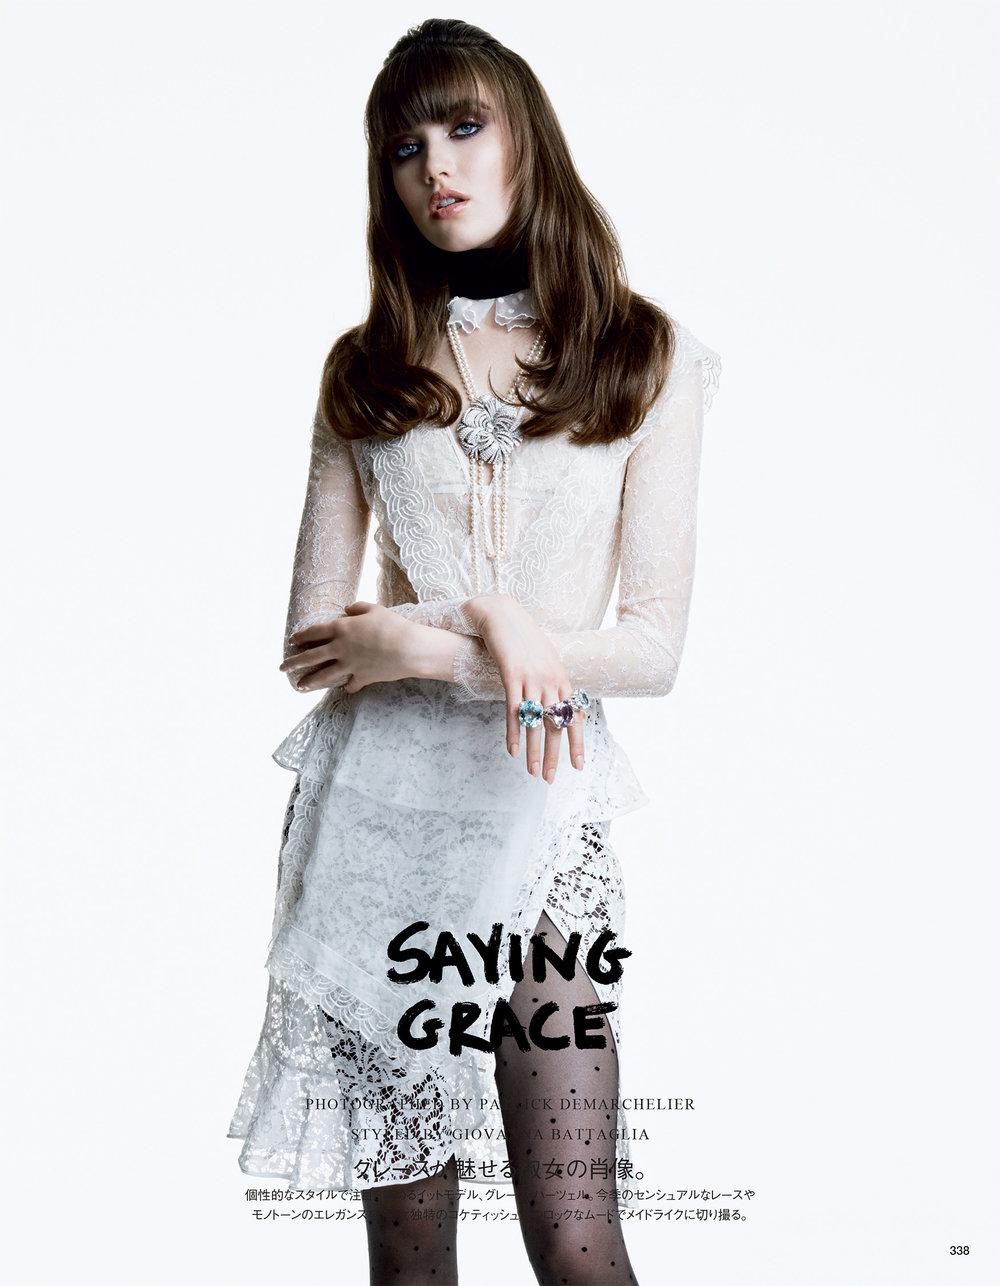 Giovanna-Battaglia-Vogue-Japan-October-2015-Patrick-Demarchelier-1.jpg